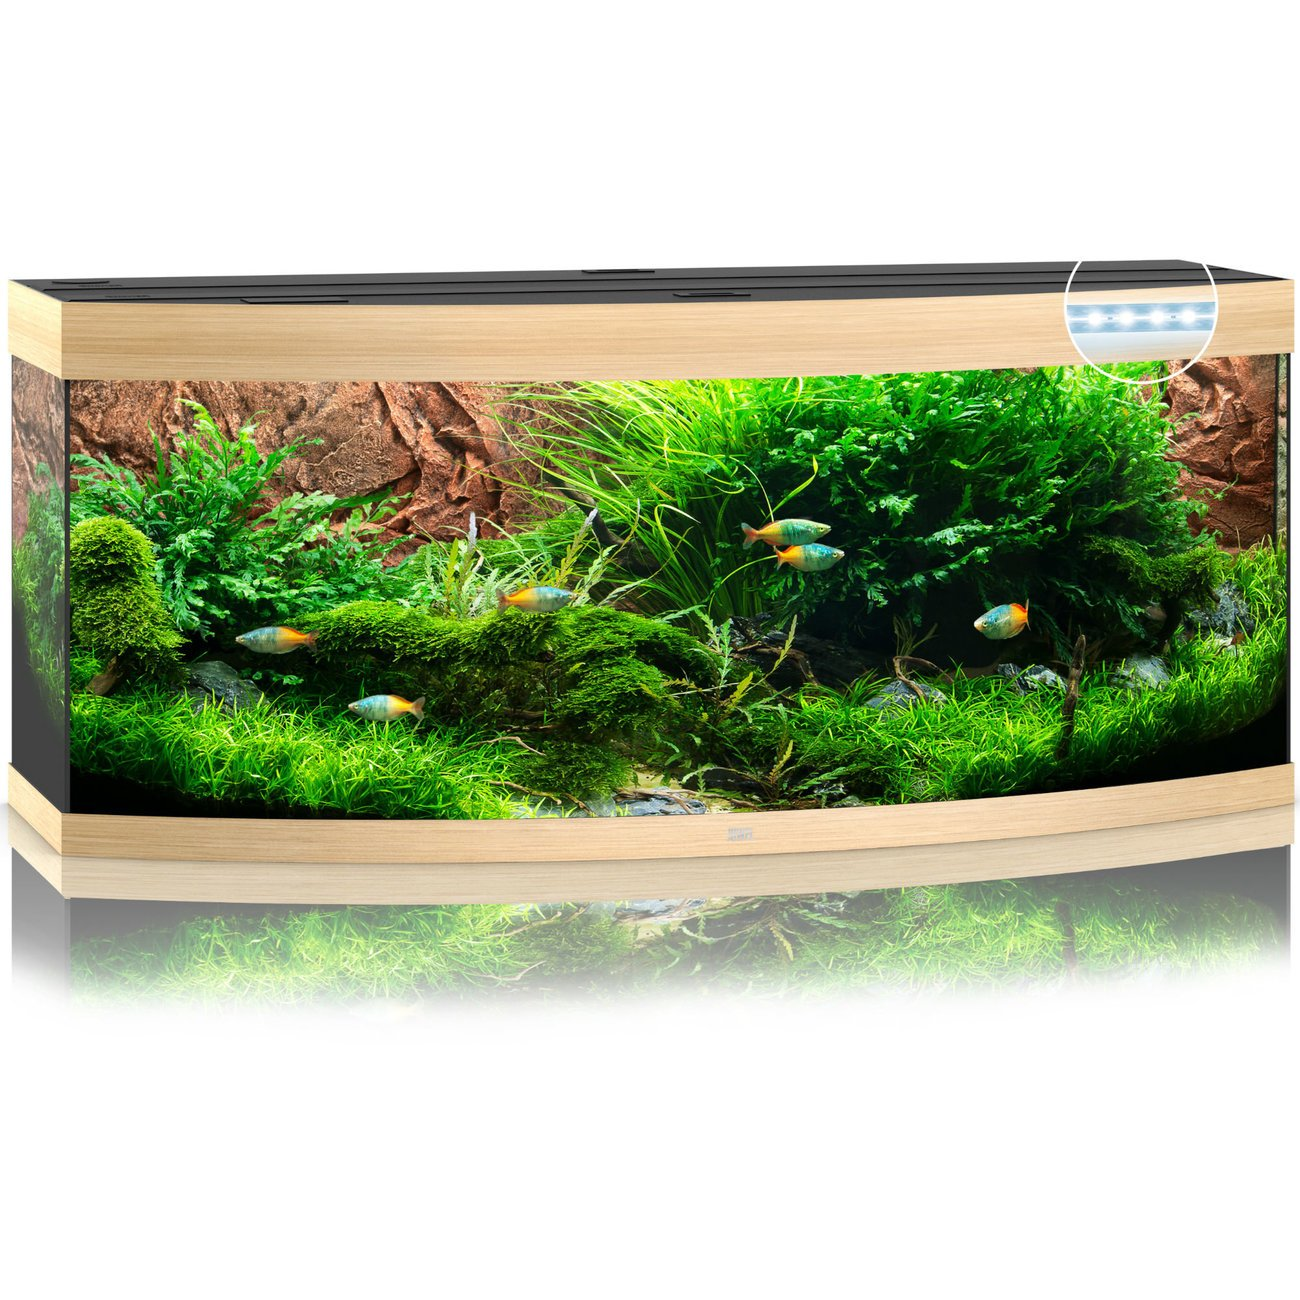 Juwel Vision 450 LED Aquarium, Bild 4